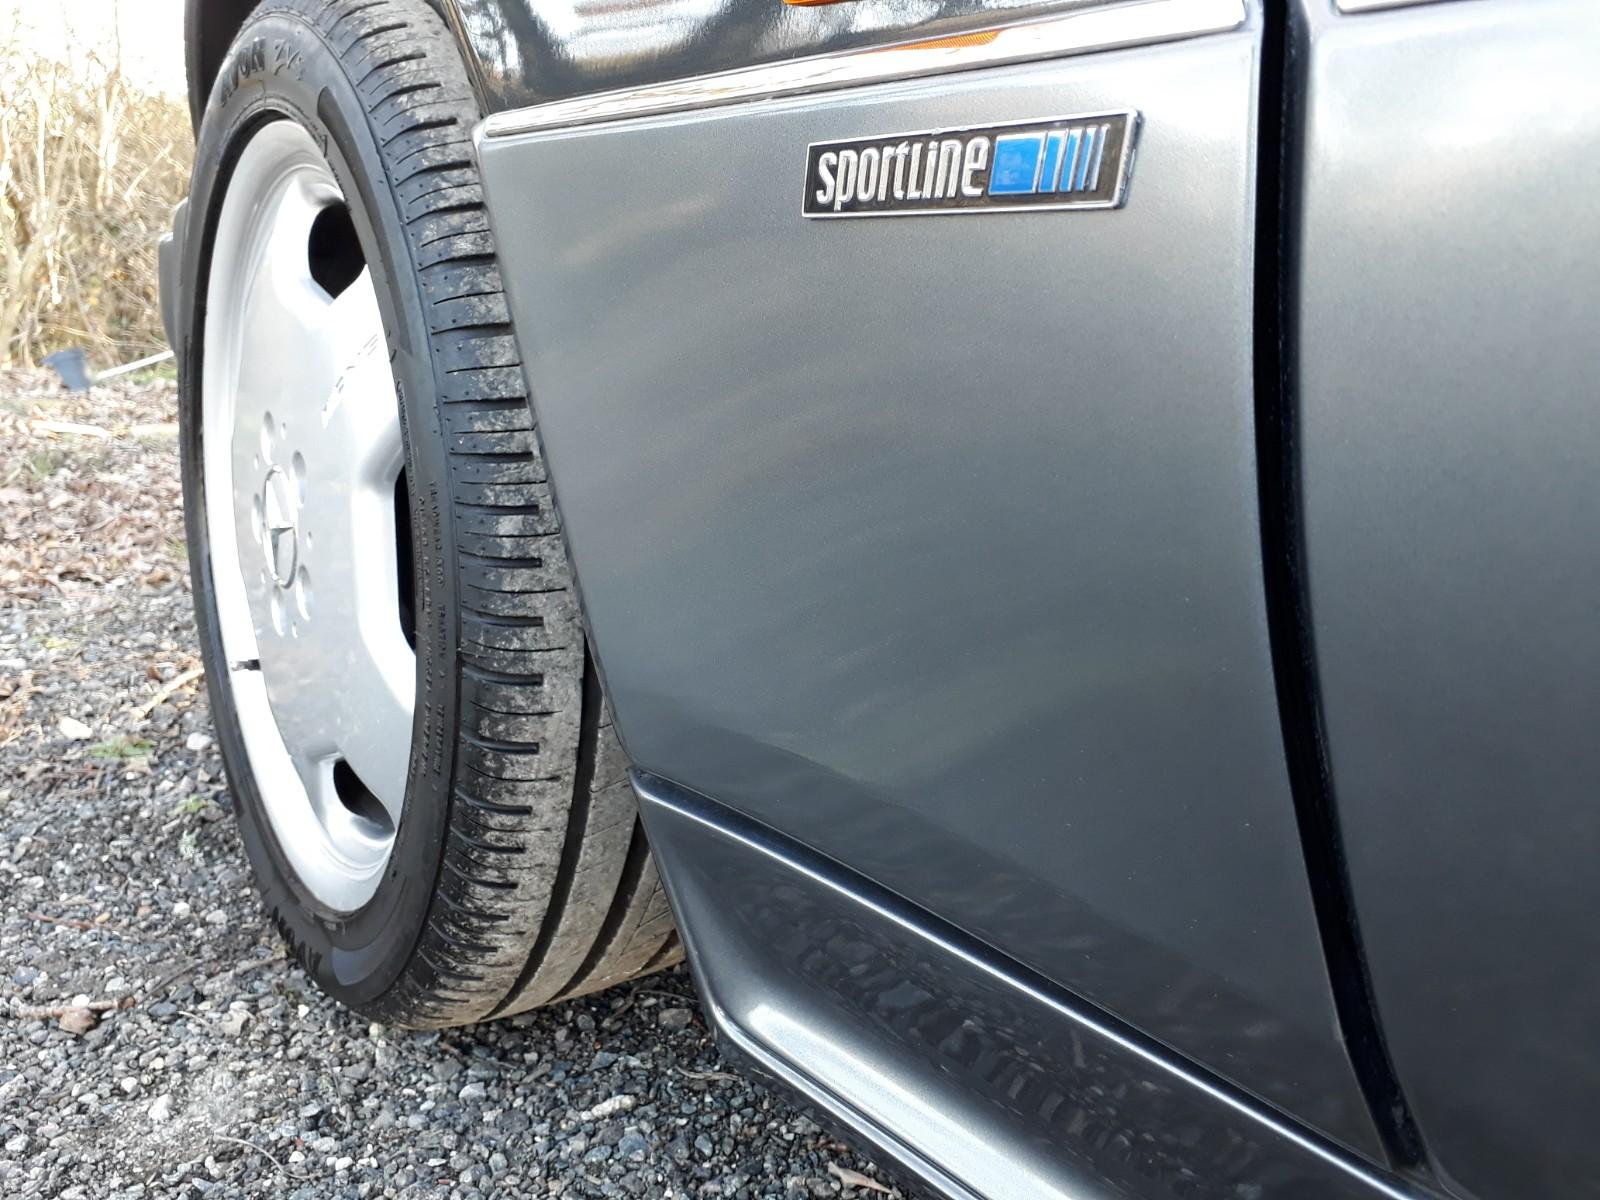 Mercedes E320 AMG Sportline